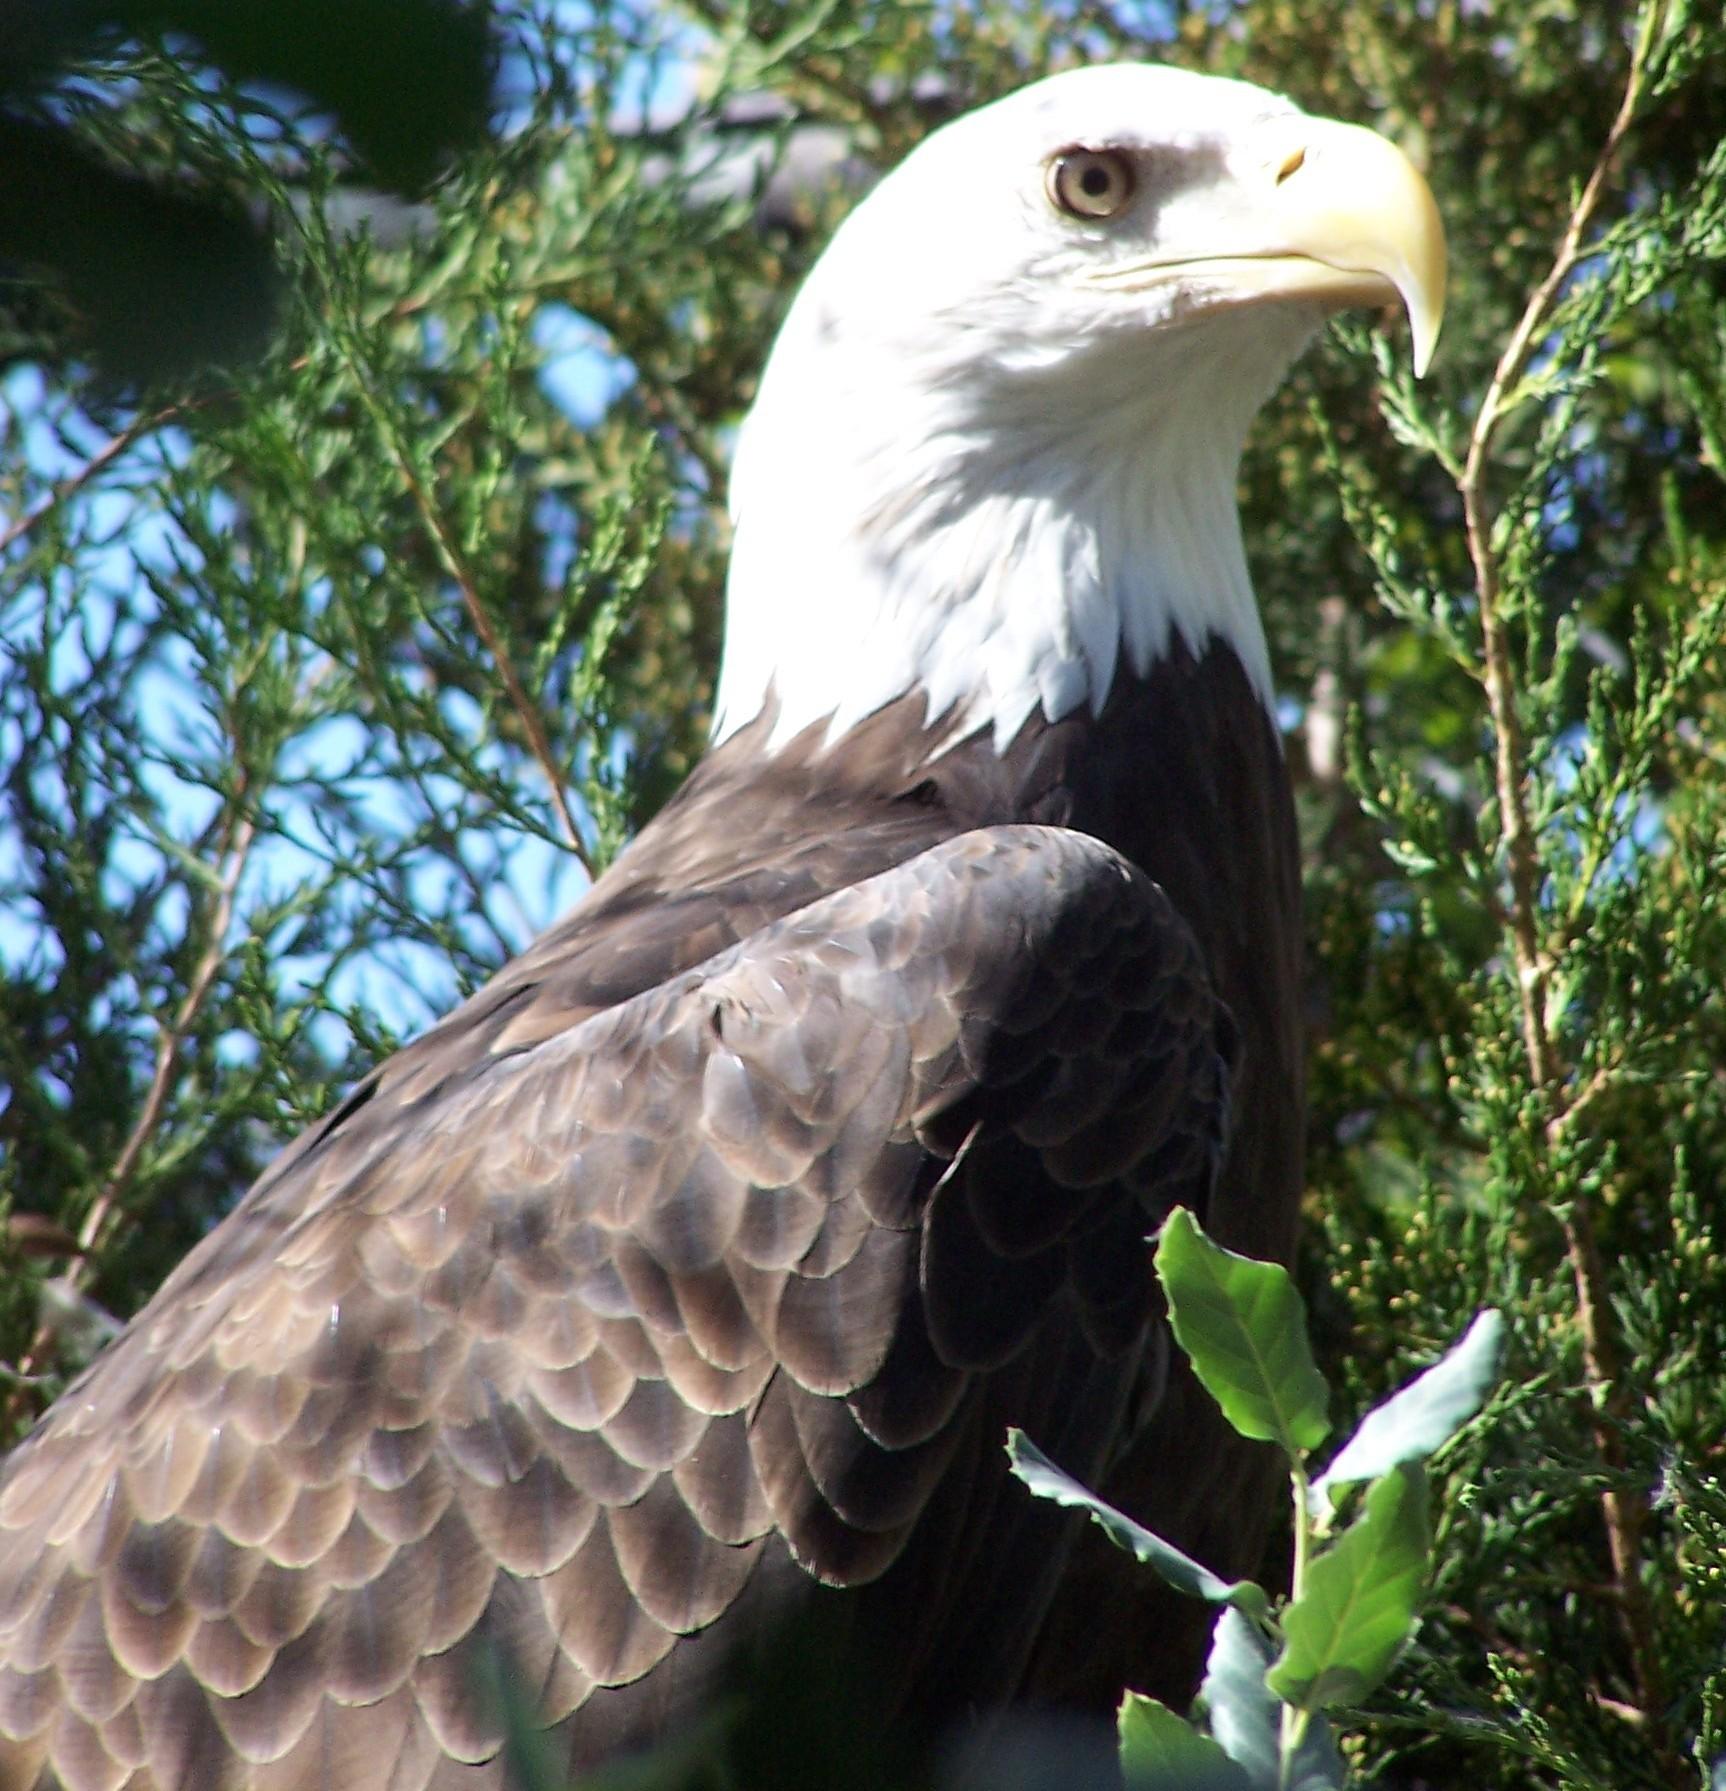 Animal Amp Conservation Micke Grove Zoo San Joaquin County